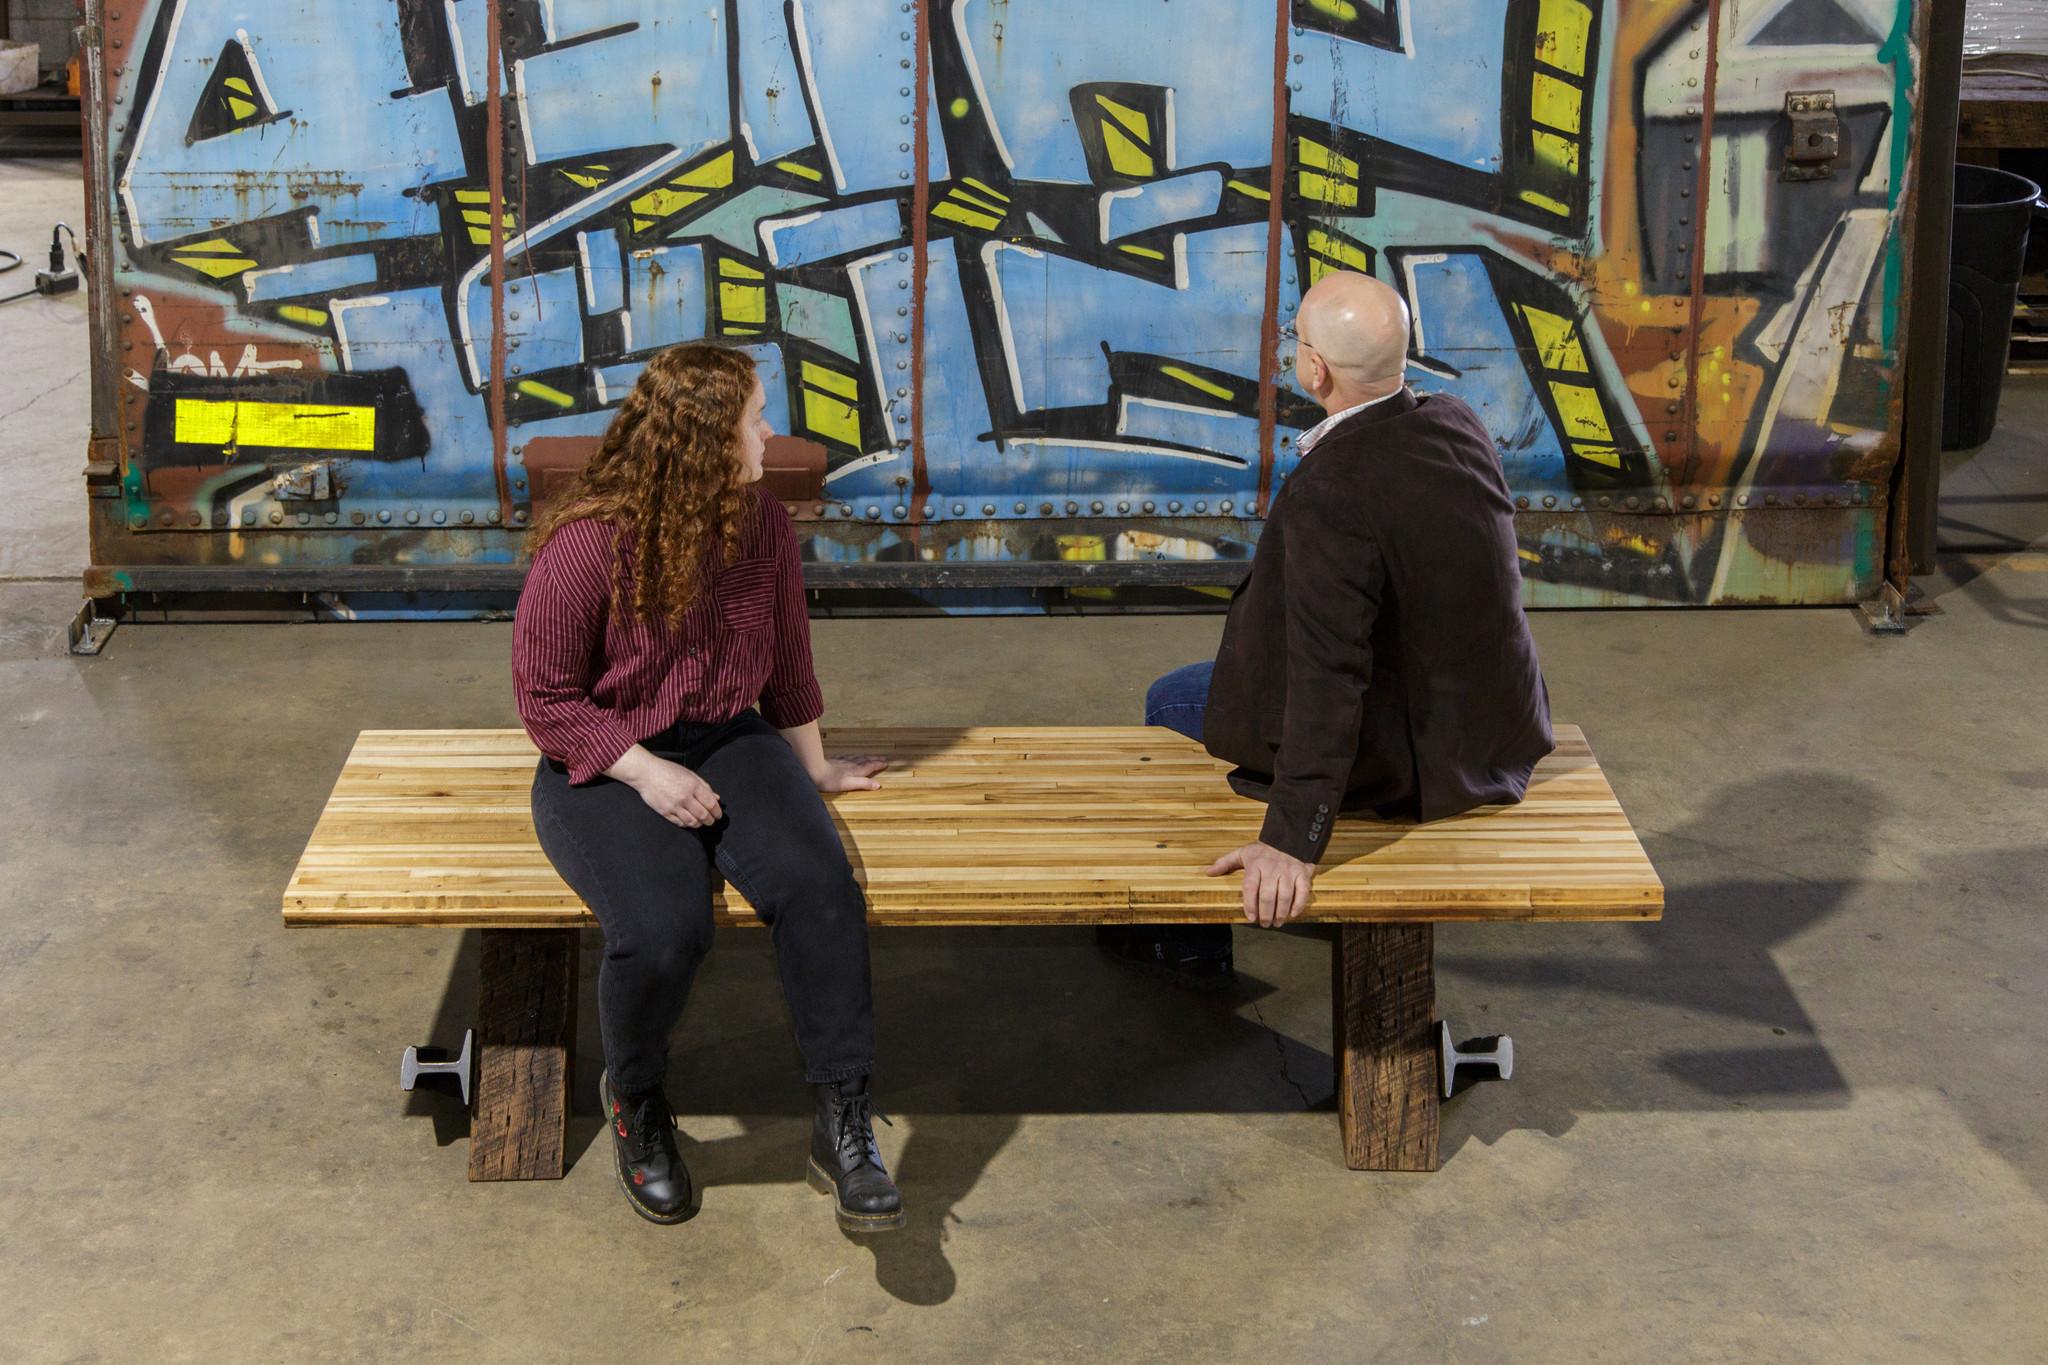 Museum space rectangular bench against graffiti background